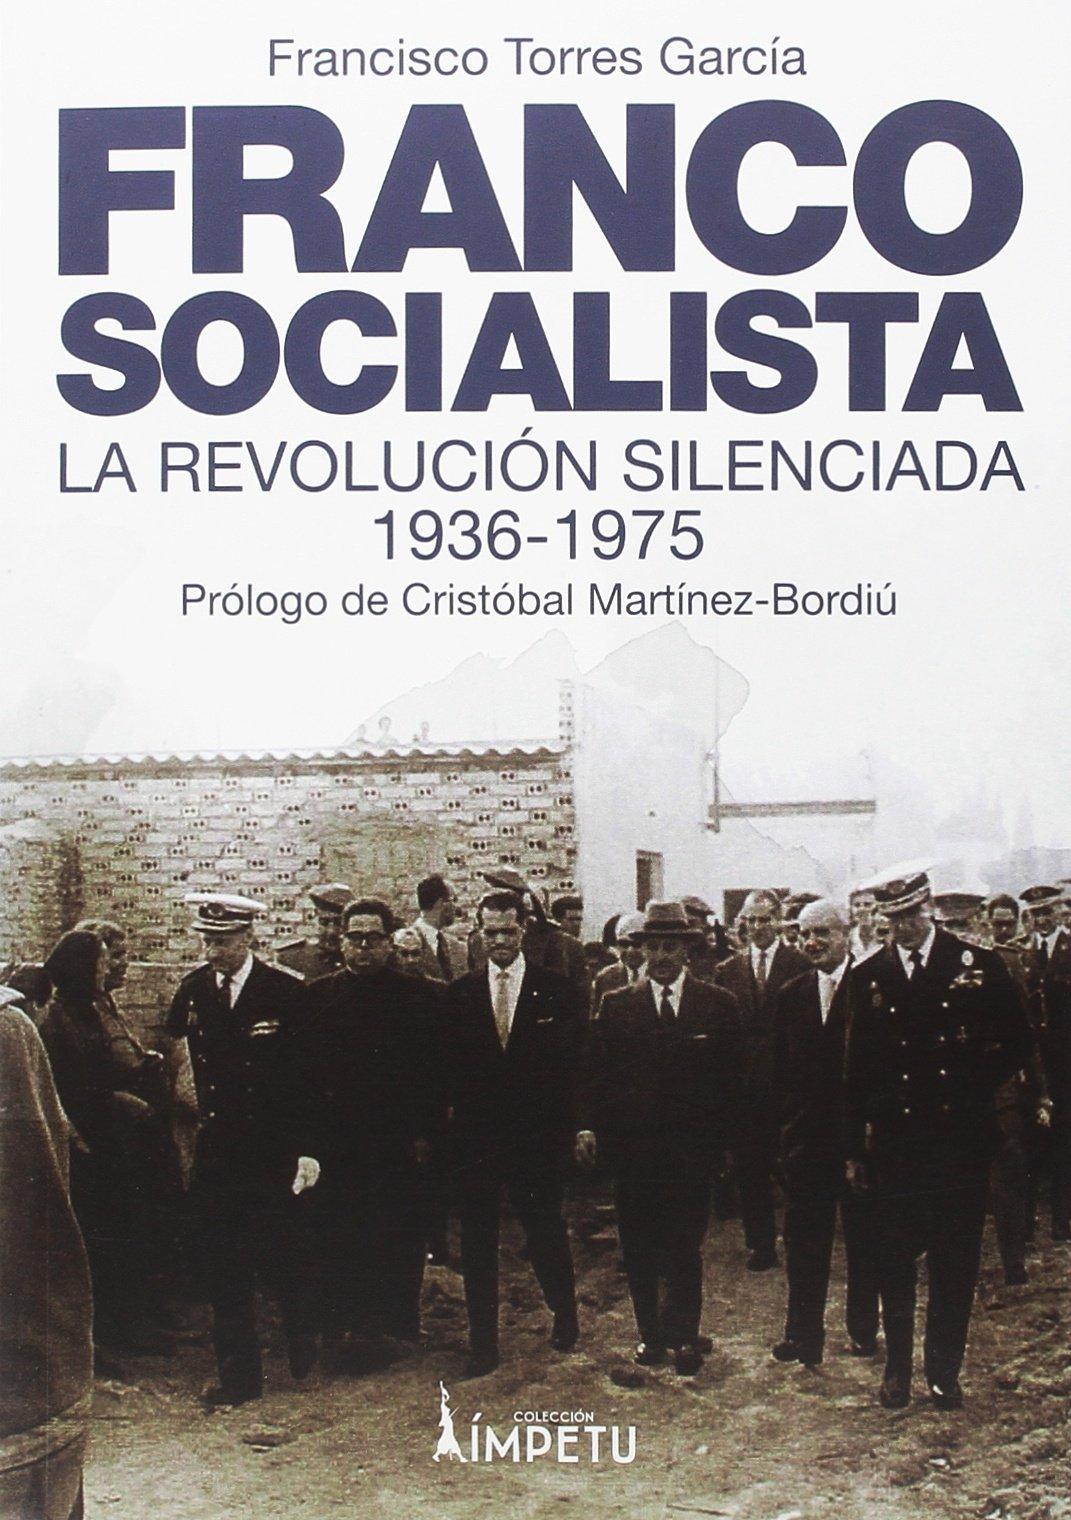 FRANCO SOCIALISTA Tapa blanda – 24 may 2018 FRANCISCO TORRES GARCÍA SDN ( SIERRA NORTE DIGITAL ) 8494684396 Modern period